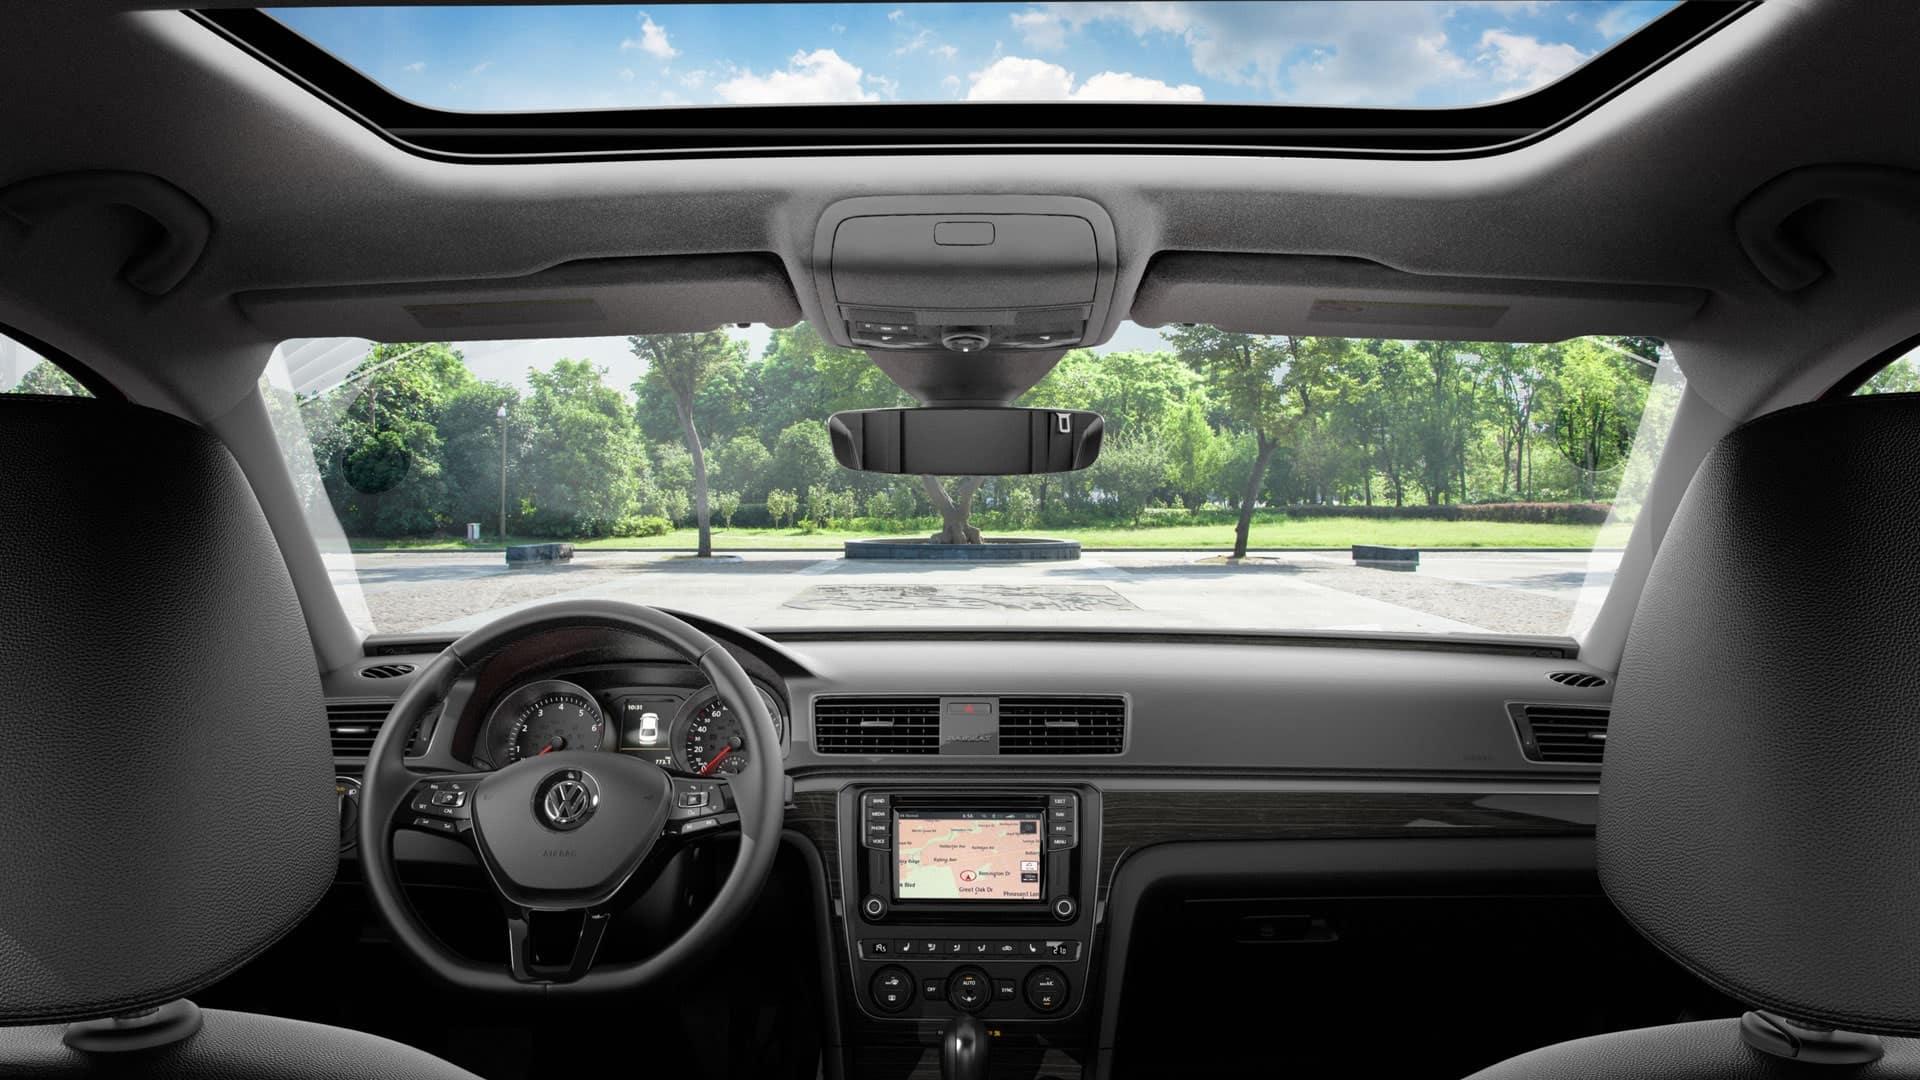 2019 VW Passat sunroof + navigation